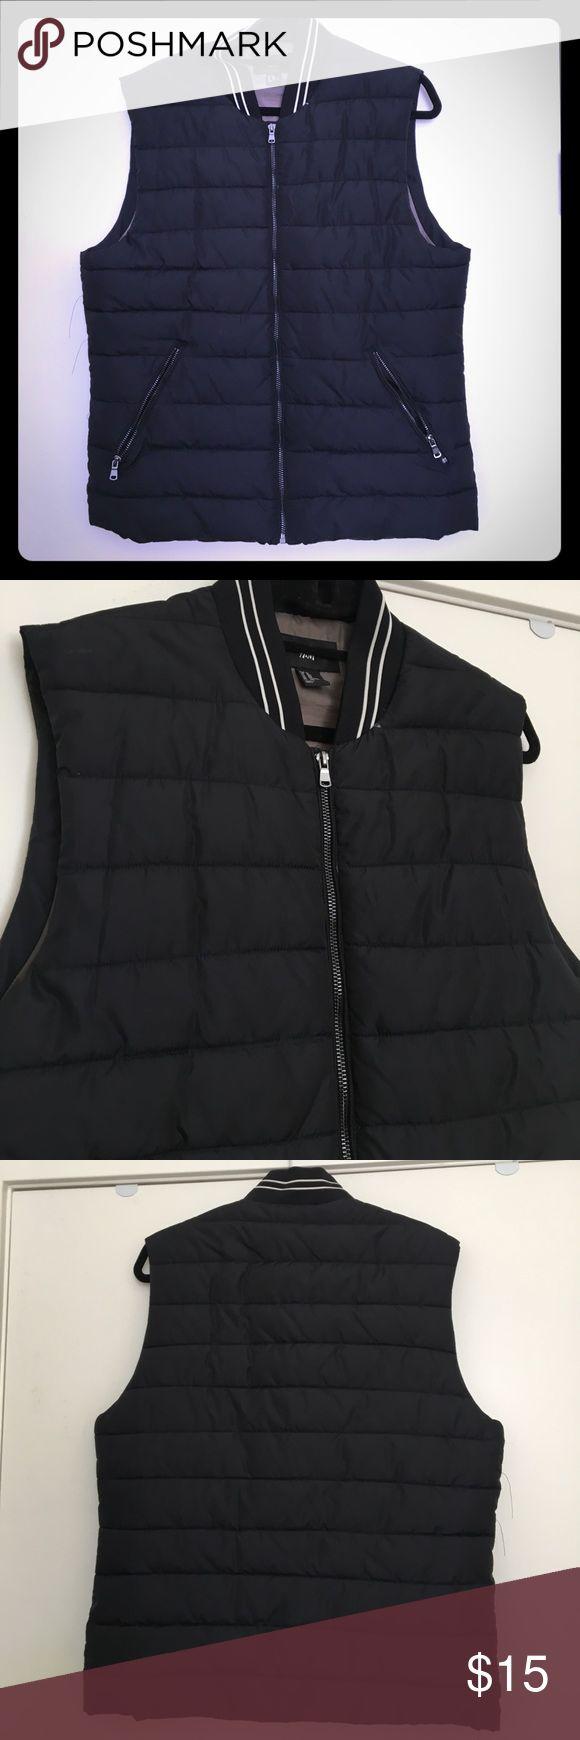 H&M Men's Puffer Vest Black puffer vest. Lightweight. Worn once. Still in brand new condition. Black with white trim on collar. H&M Suits & Blazers Vests